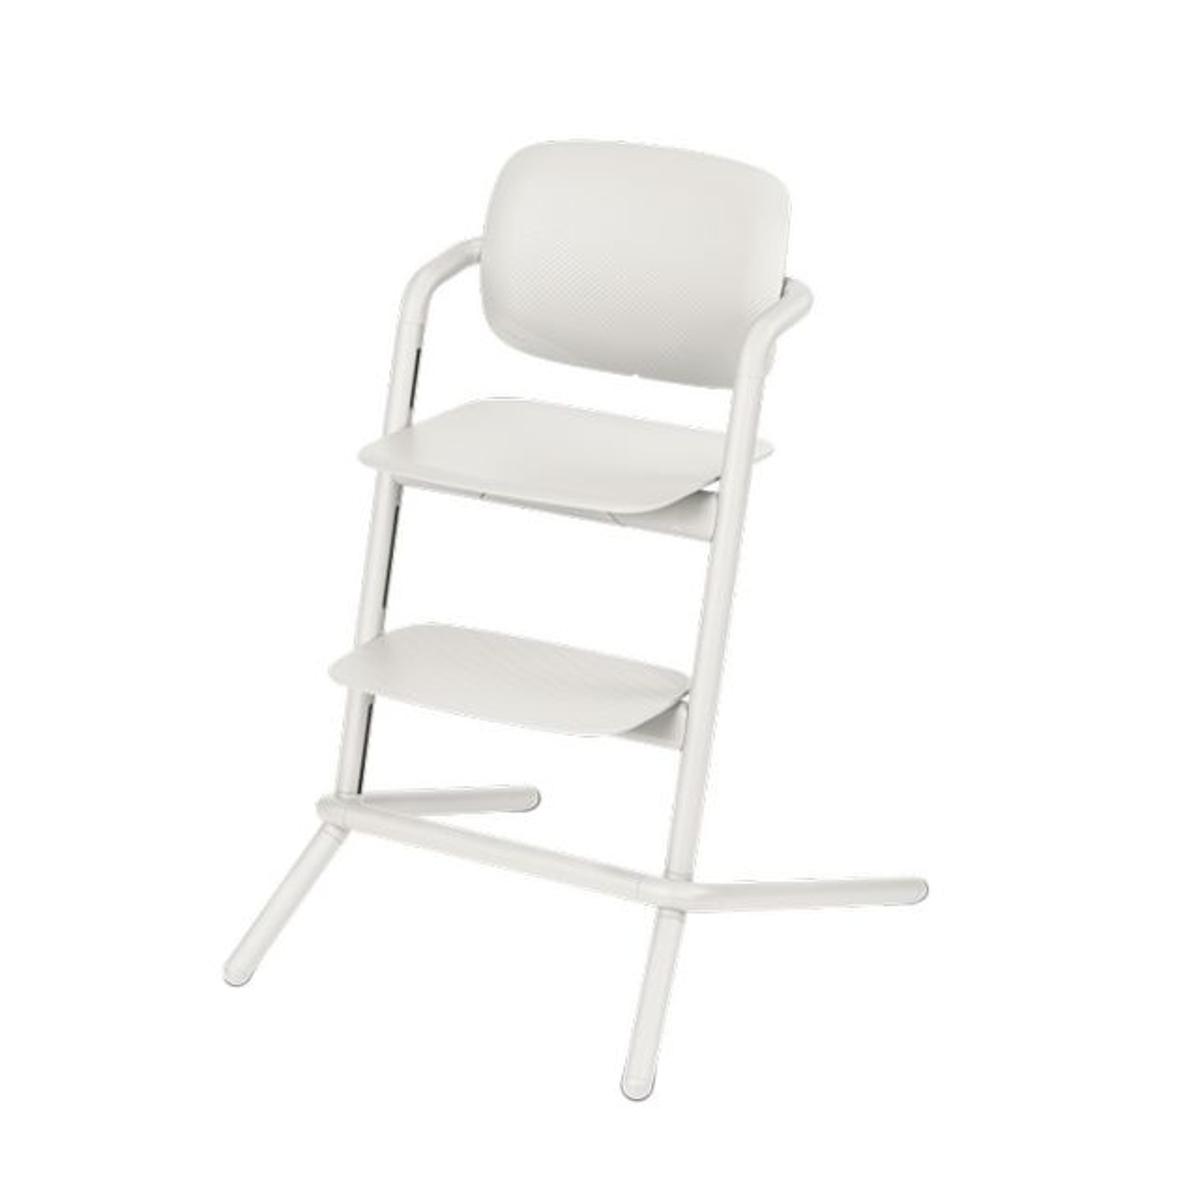 Chaise haute Lemo porcelaine white